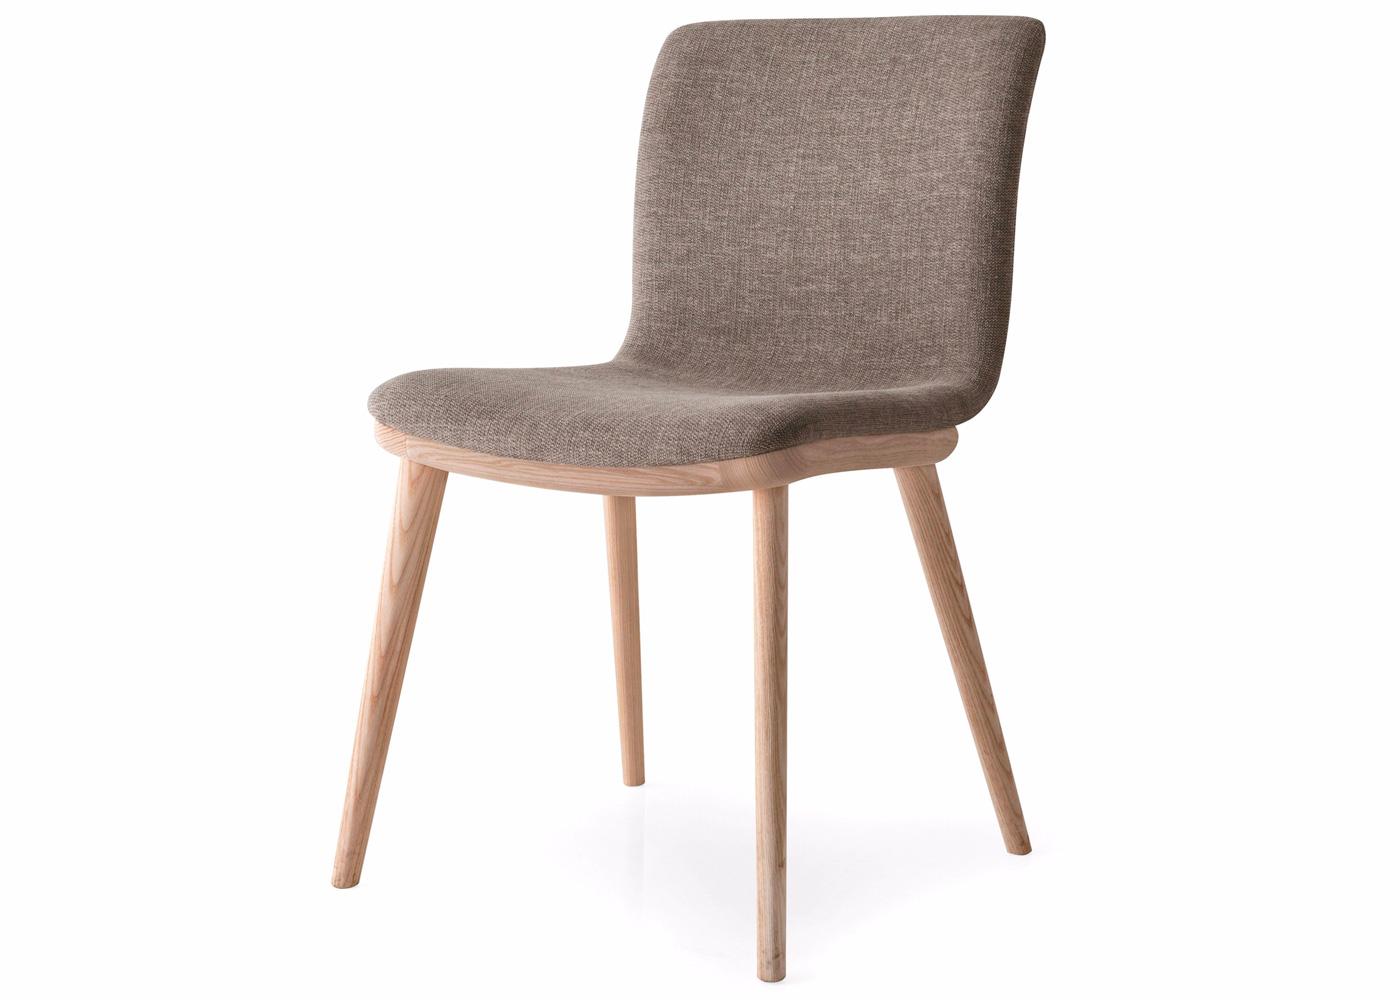 calligaris sofas uk nubuck leather sofa care annie chair midfurn furniture superstore